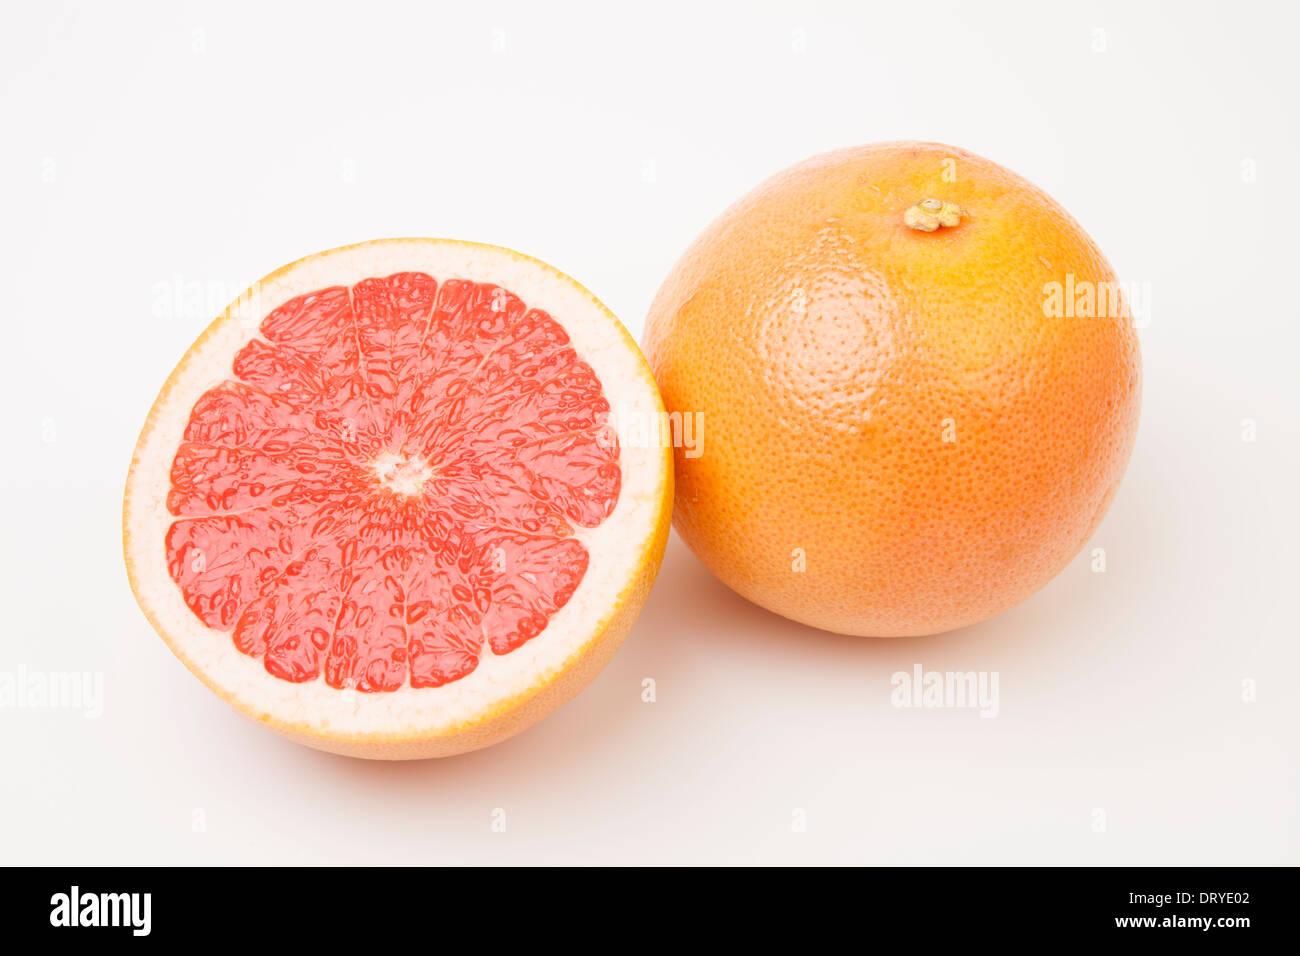 Sliced ruby red grapefruit on white background - Stock Image